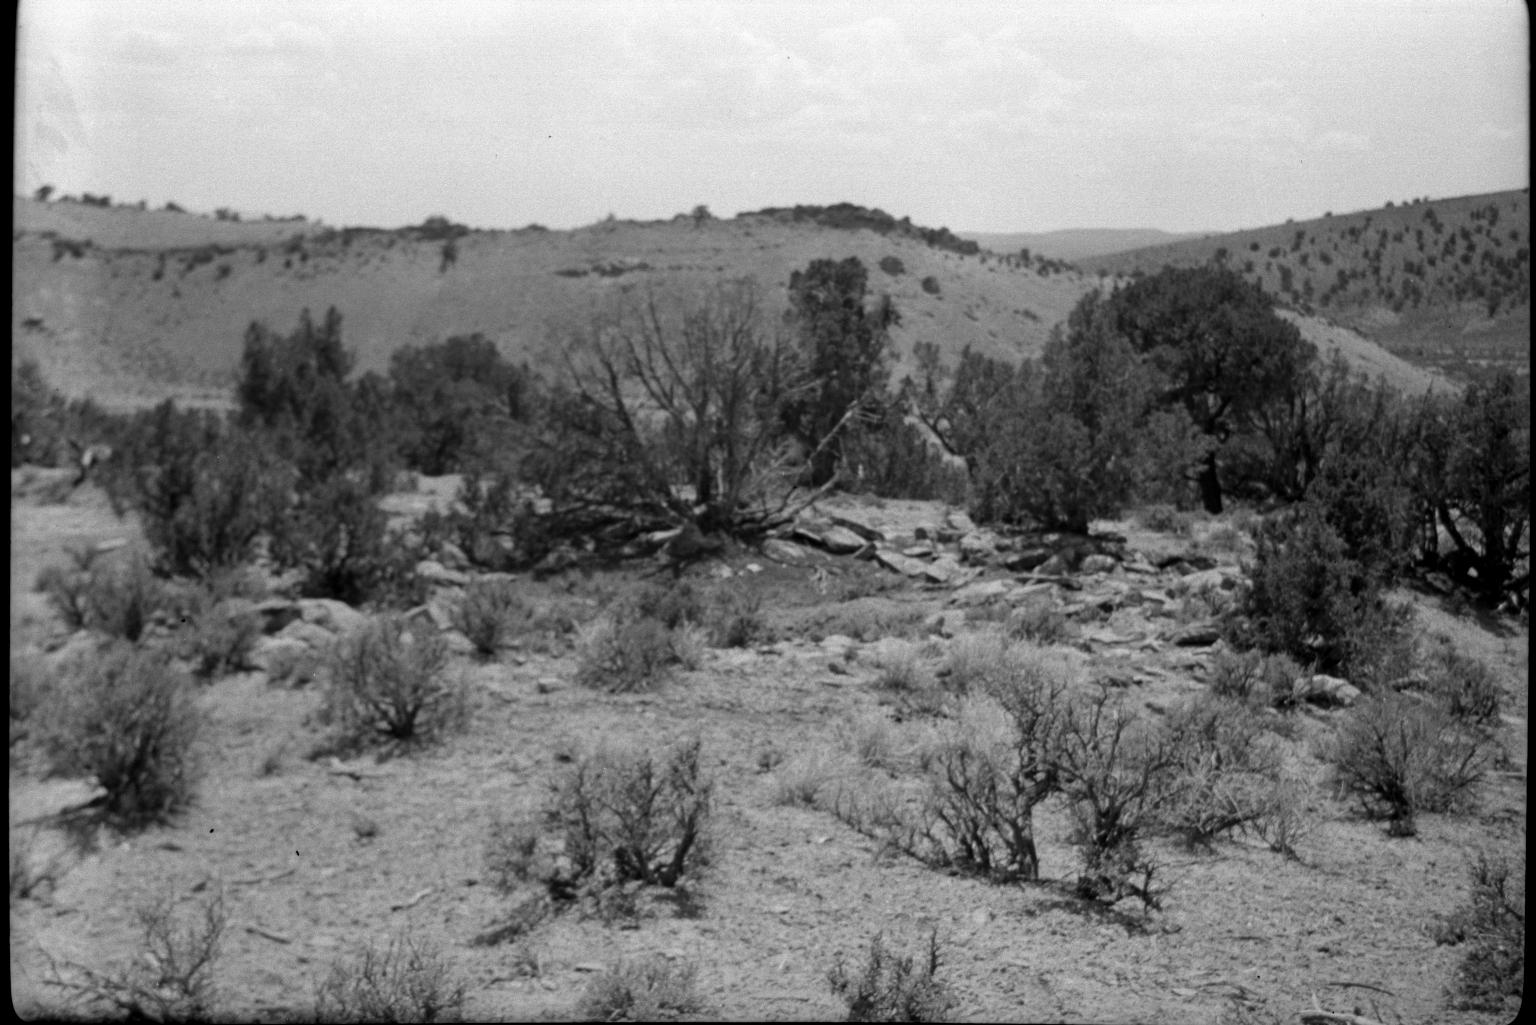 Desert foliage surrounding an archaeological site